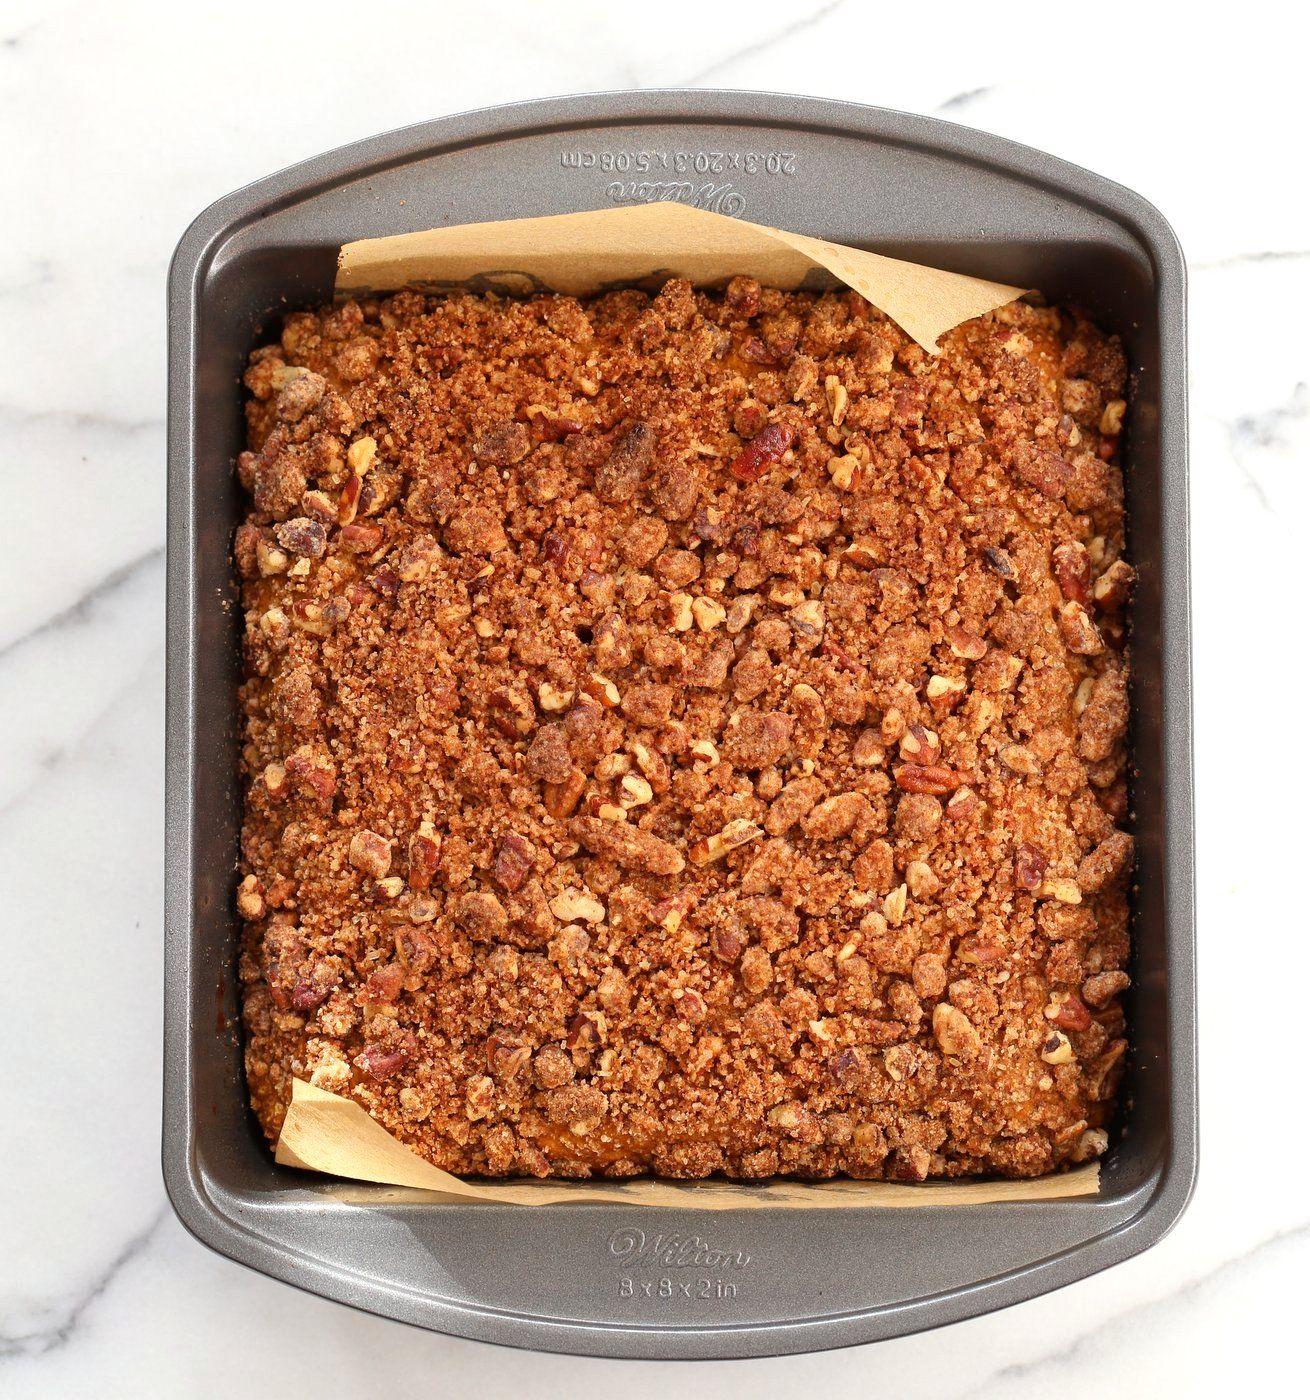 Vegan Pumpkin Coffee Cake with Pecan Crumb Recipe